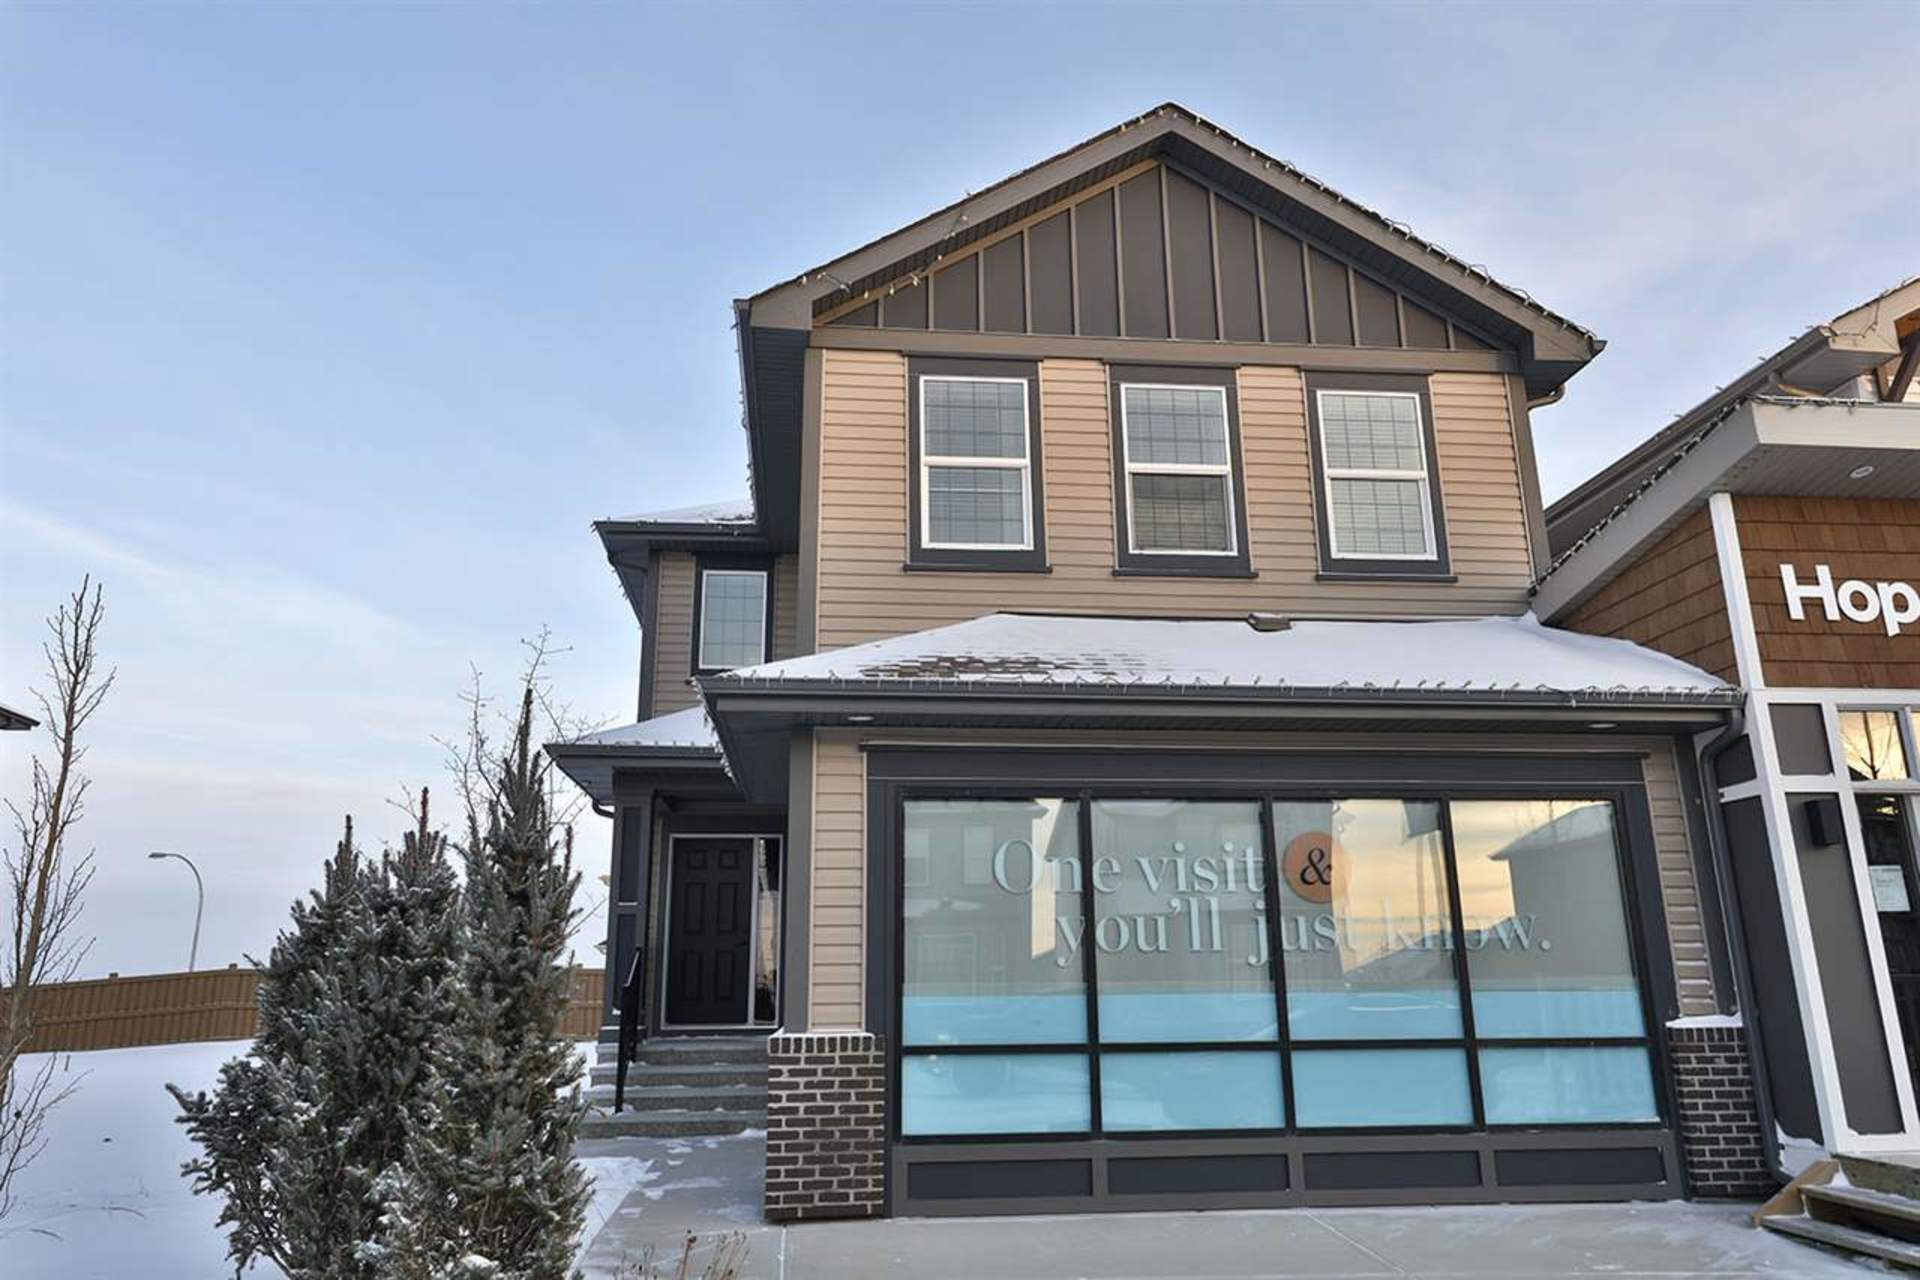 17843-61-street-mcconachie-area-edmonton-01 at 17843 61 Street, McConachie Area, Edmonton